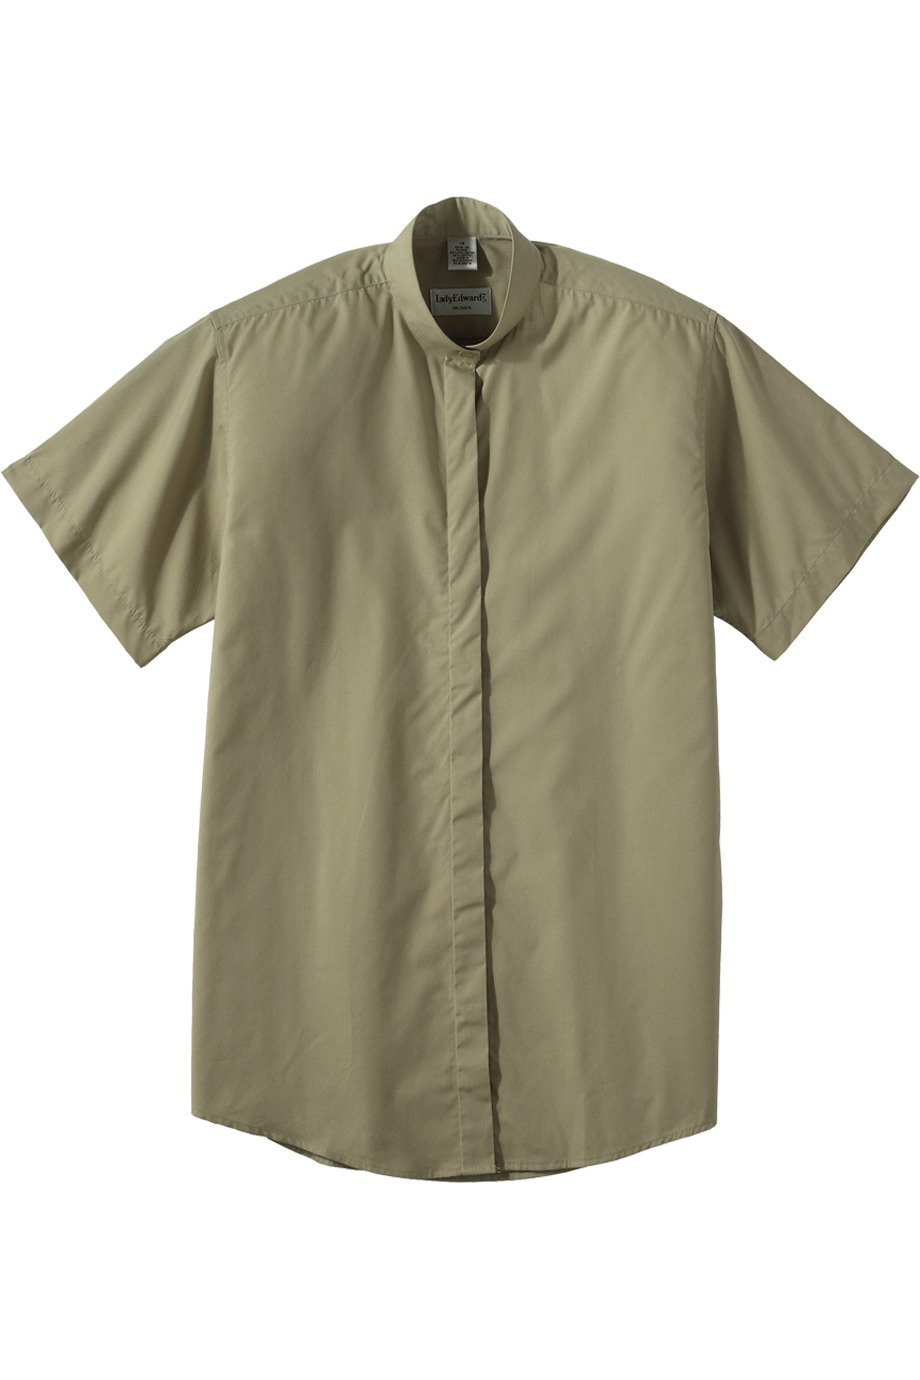 Edwards Garment 5346 - Women's Short Sleeve Banded Collar ...